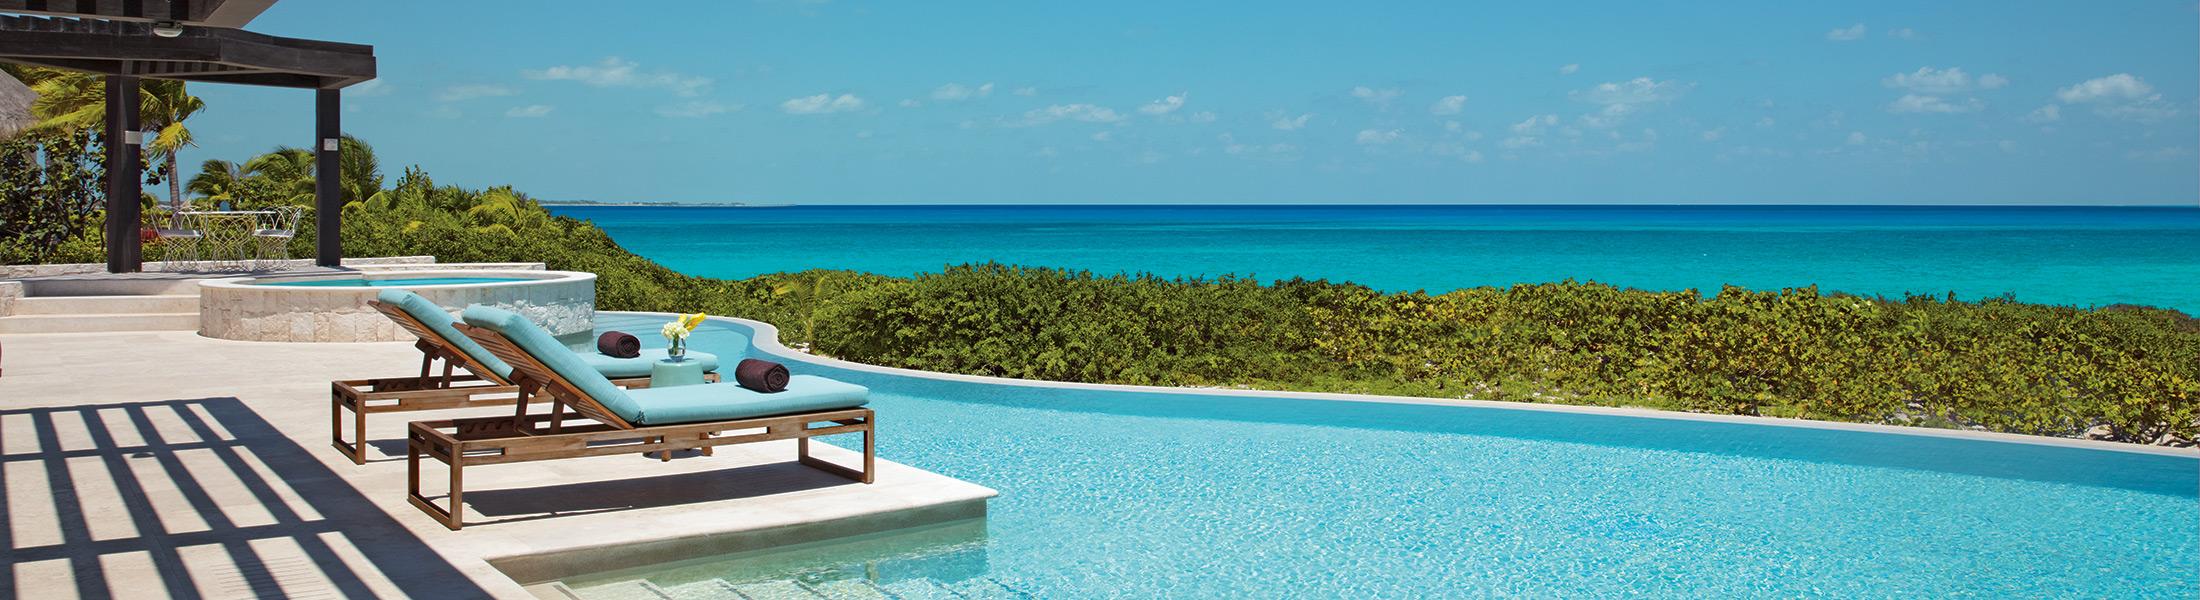 Presidential Suite private pool at Dreams Playa Mujeres